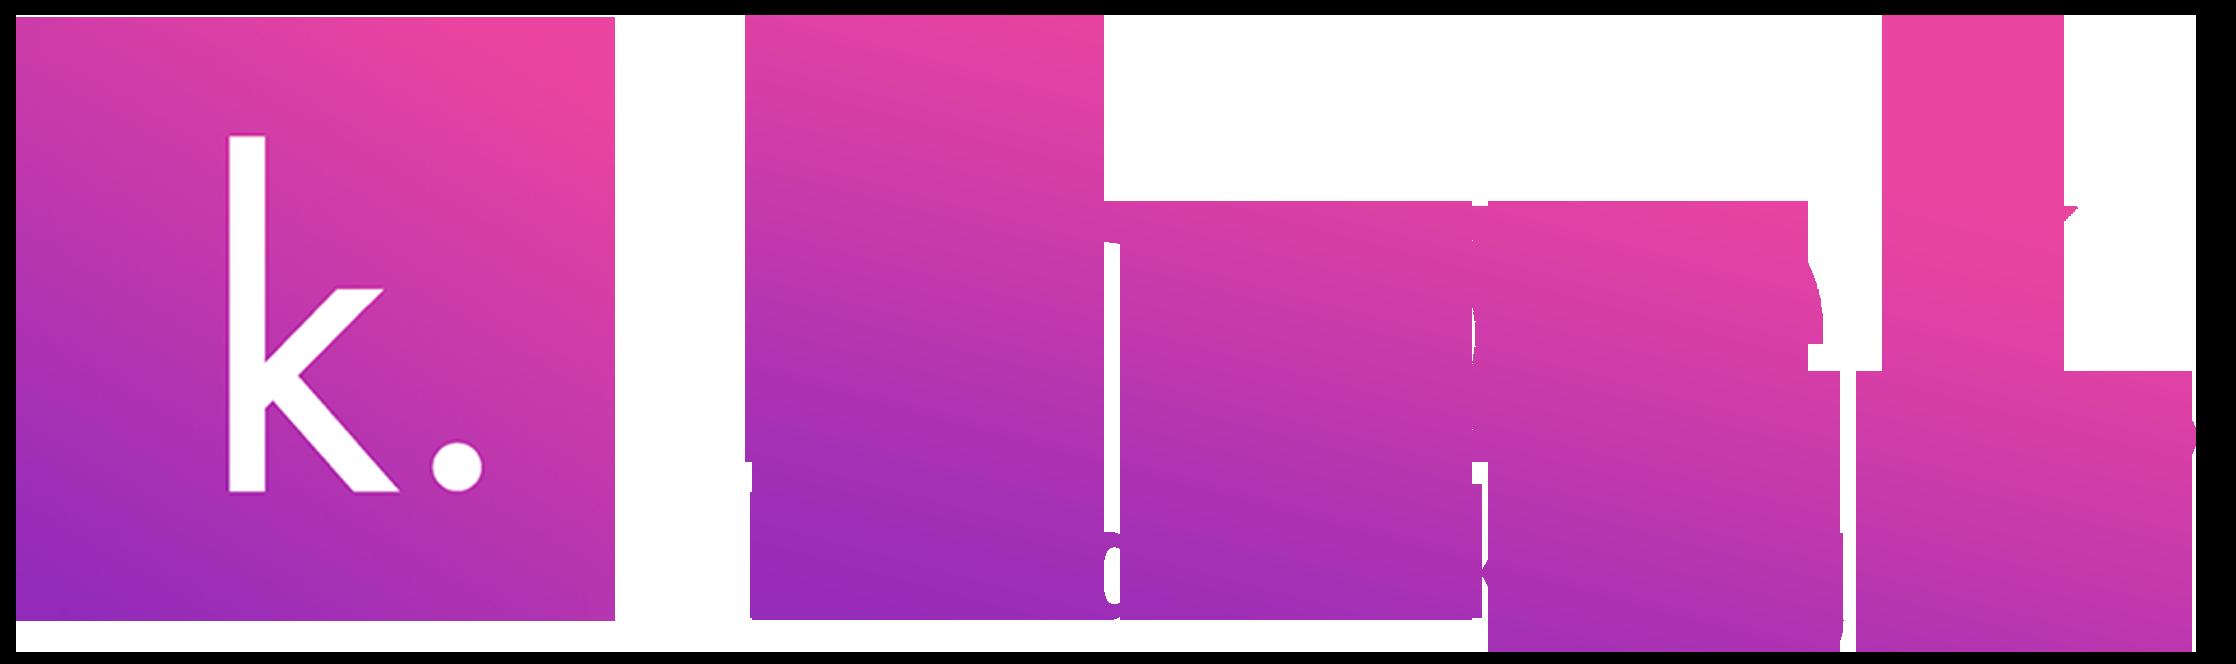 https://mszvtiburon.nl/wp-content/uploads/2020/02/knaek.png